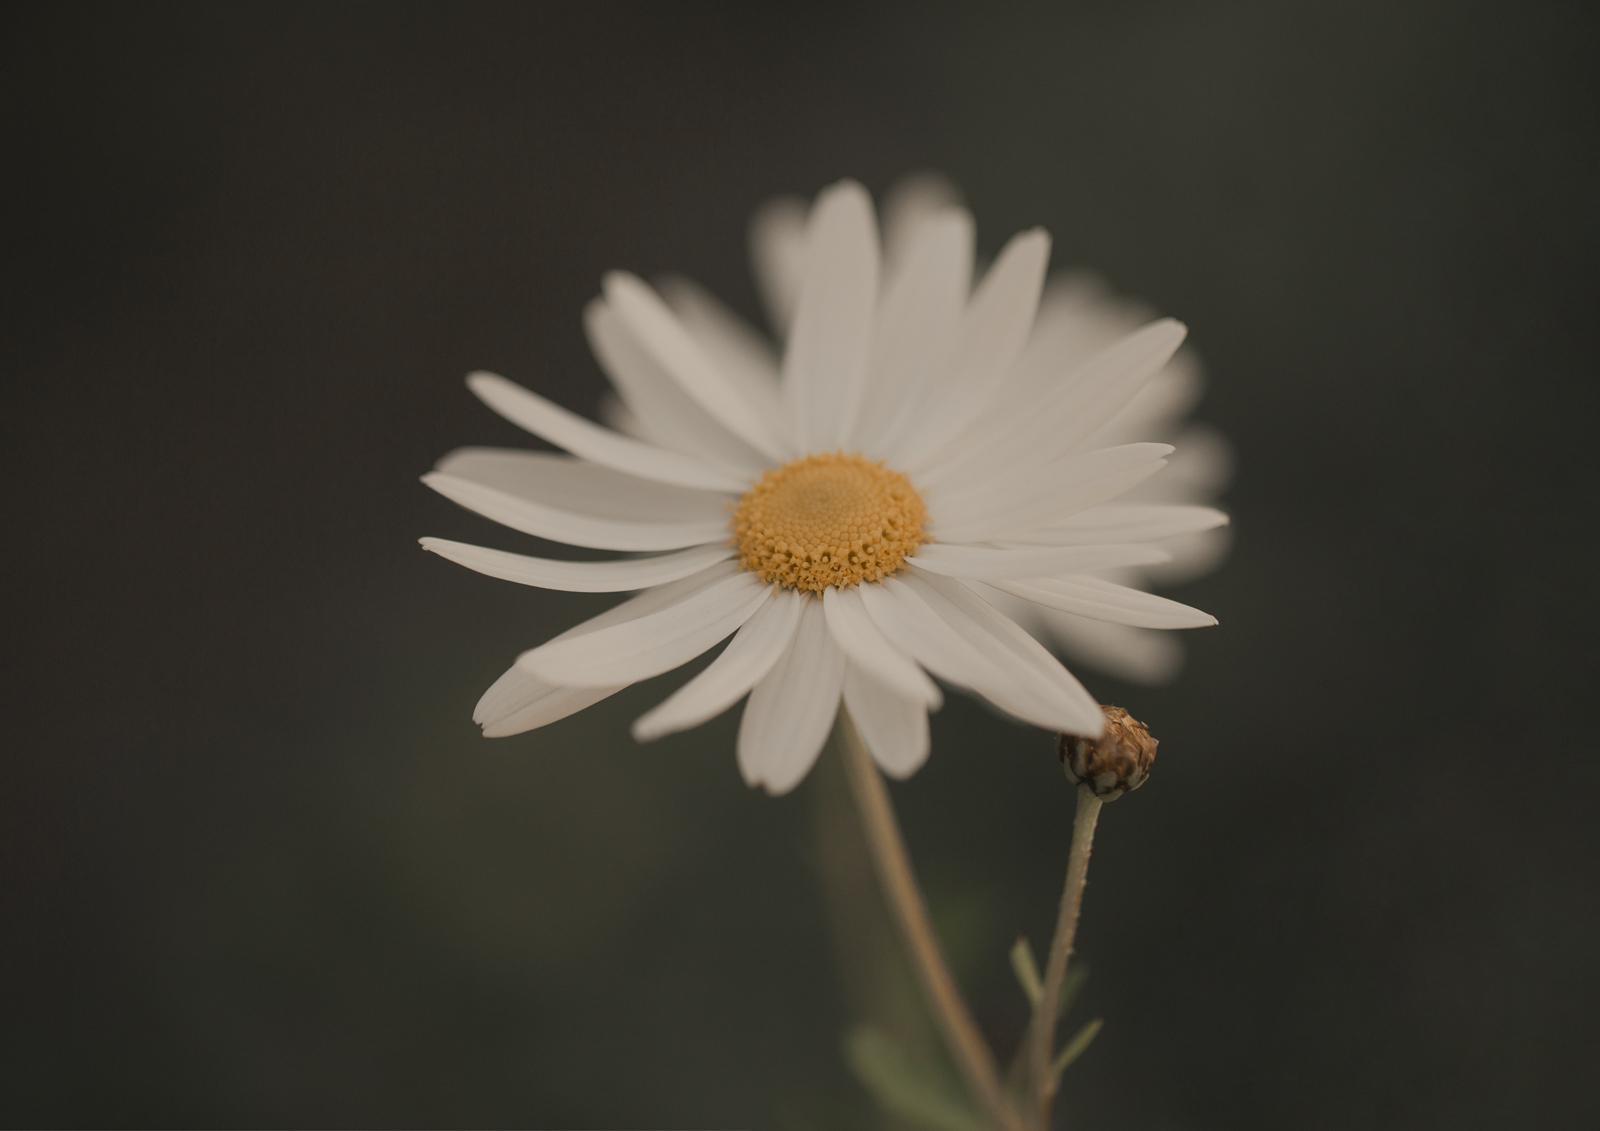 Daisy flower